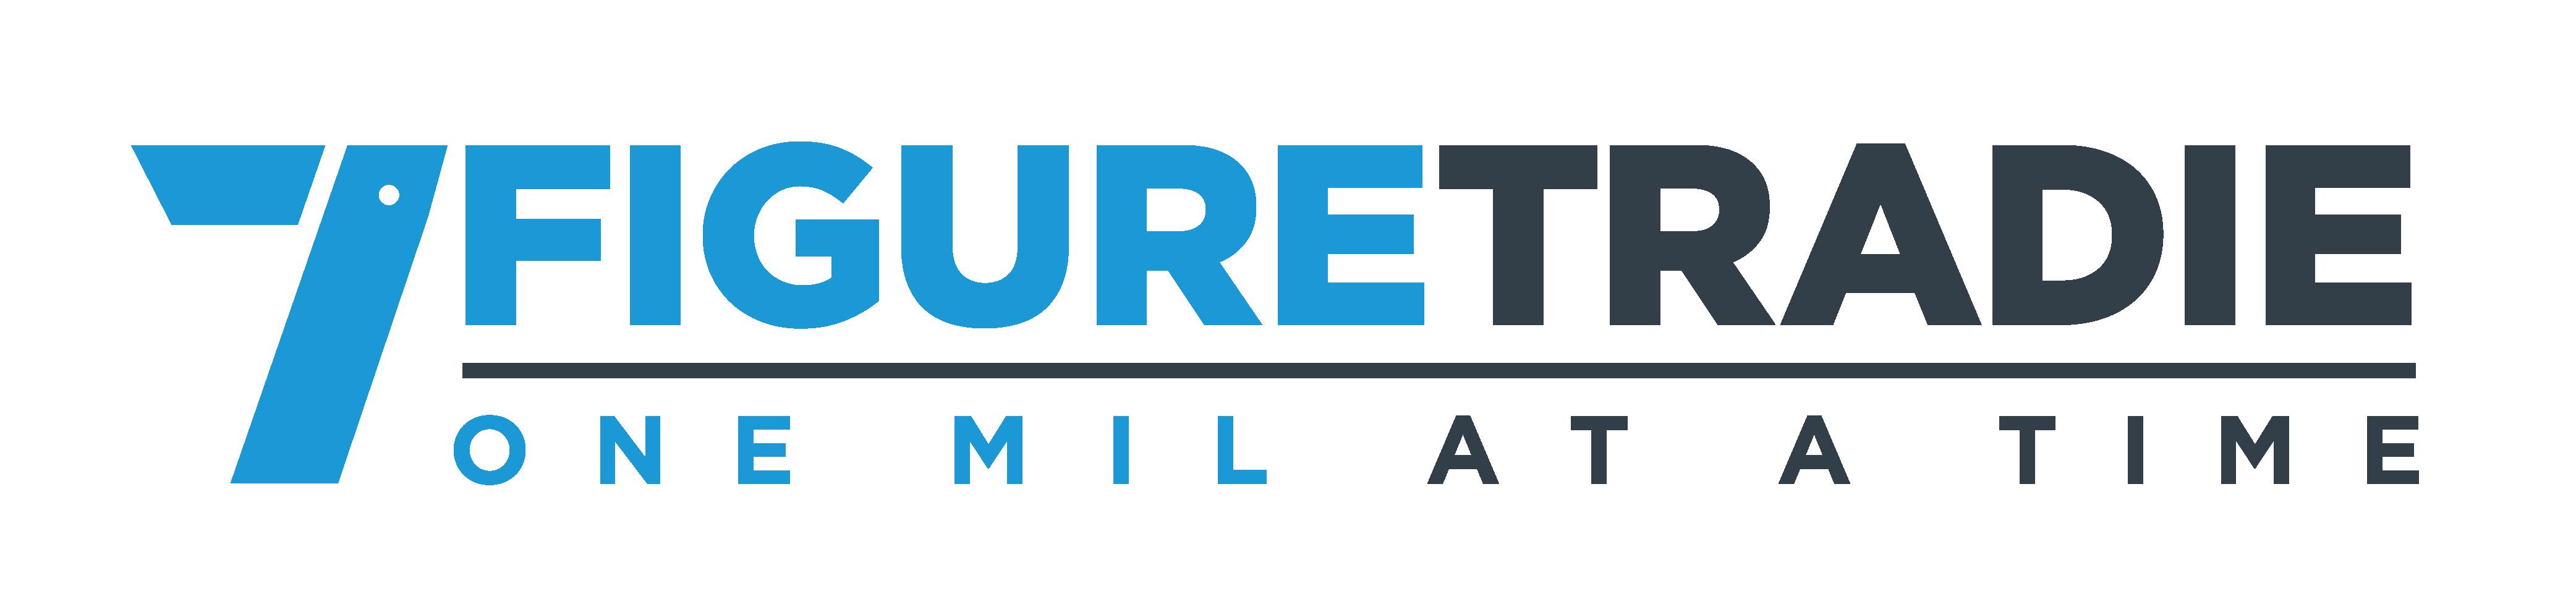 Distinctive Powerful Logo for 7 Figure Tradie